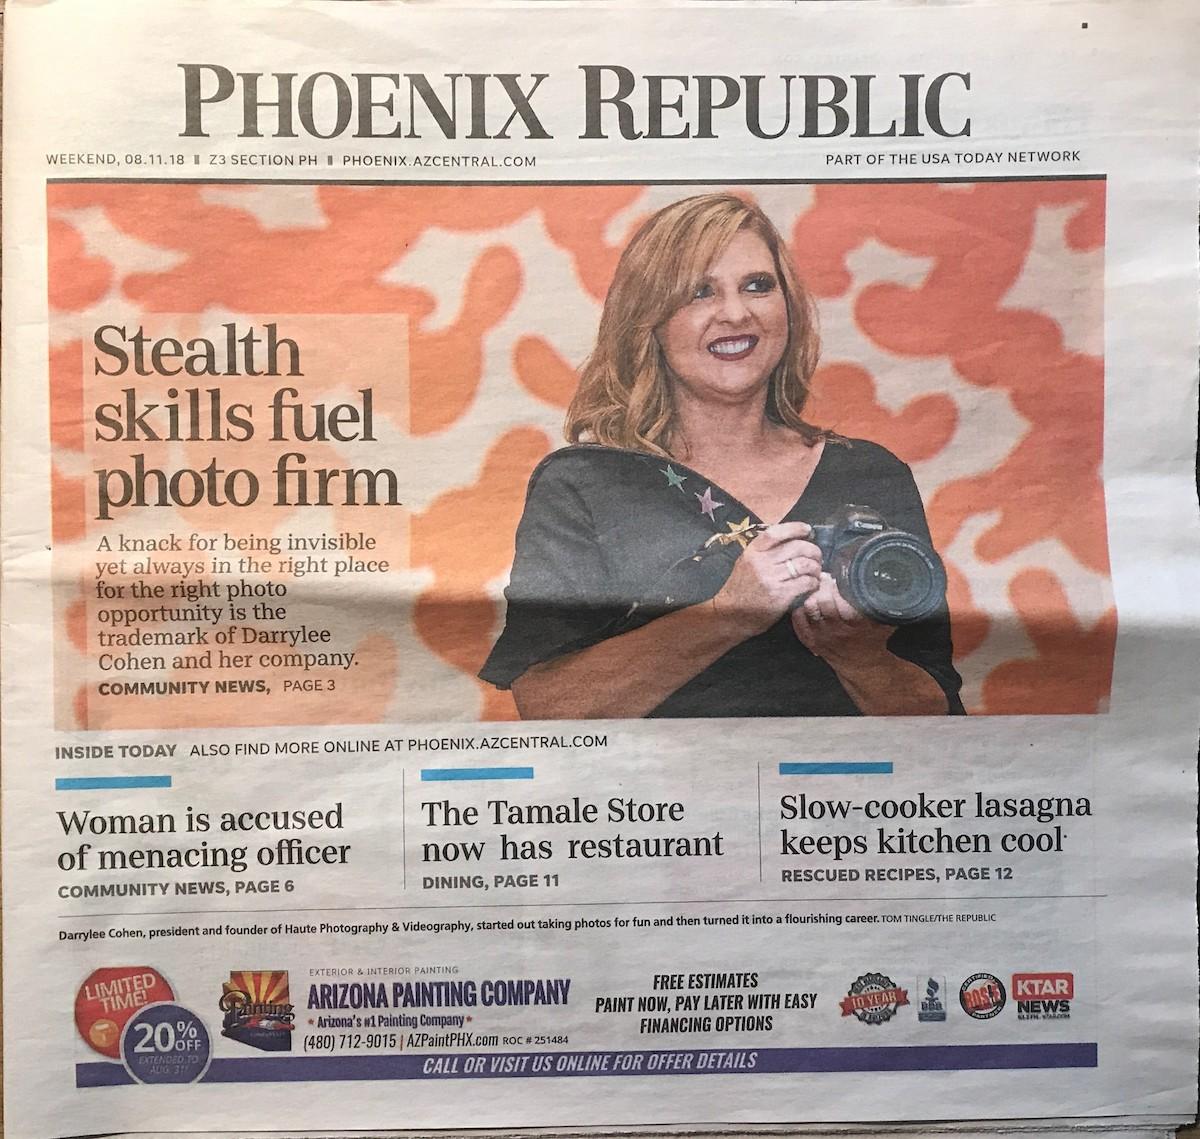 Phoenix Republic 8.11.18